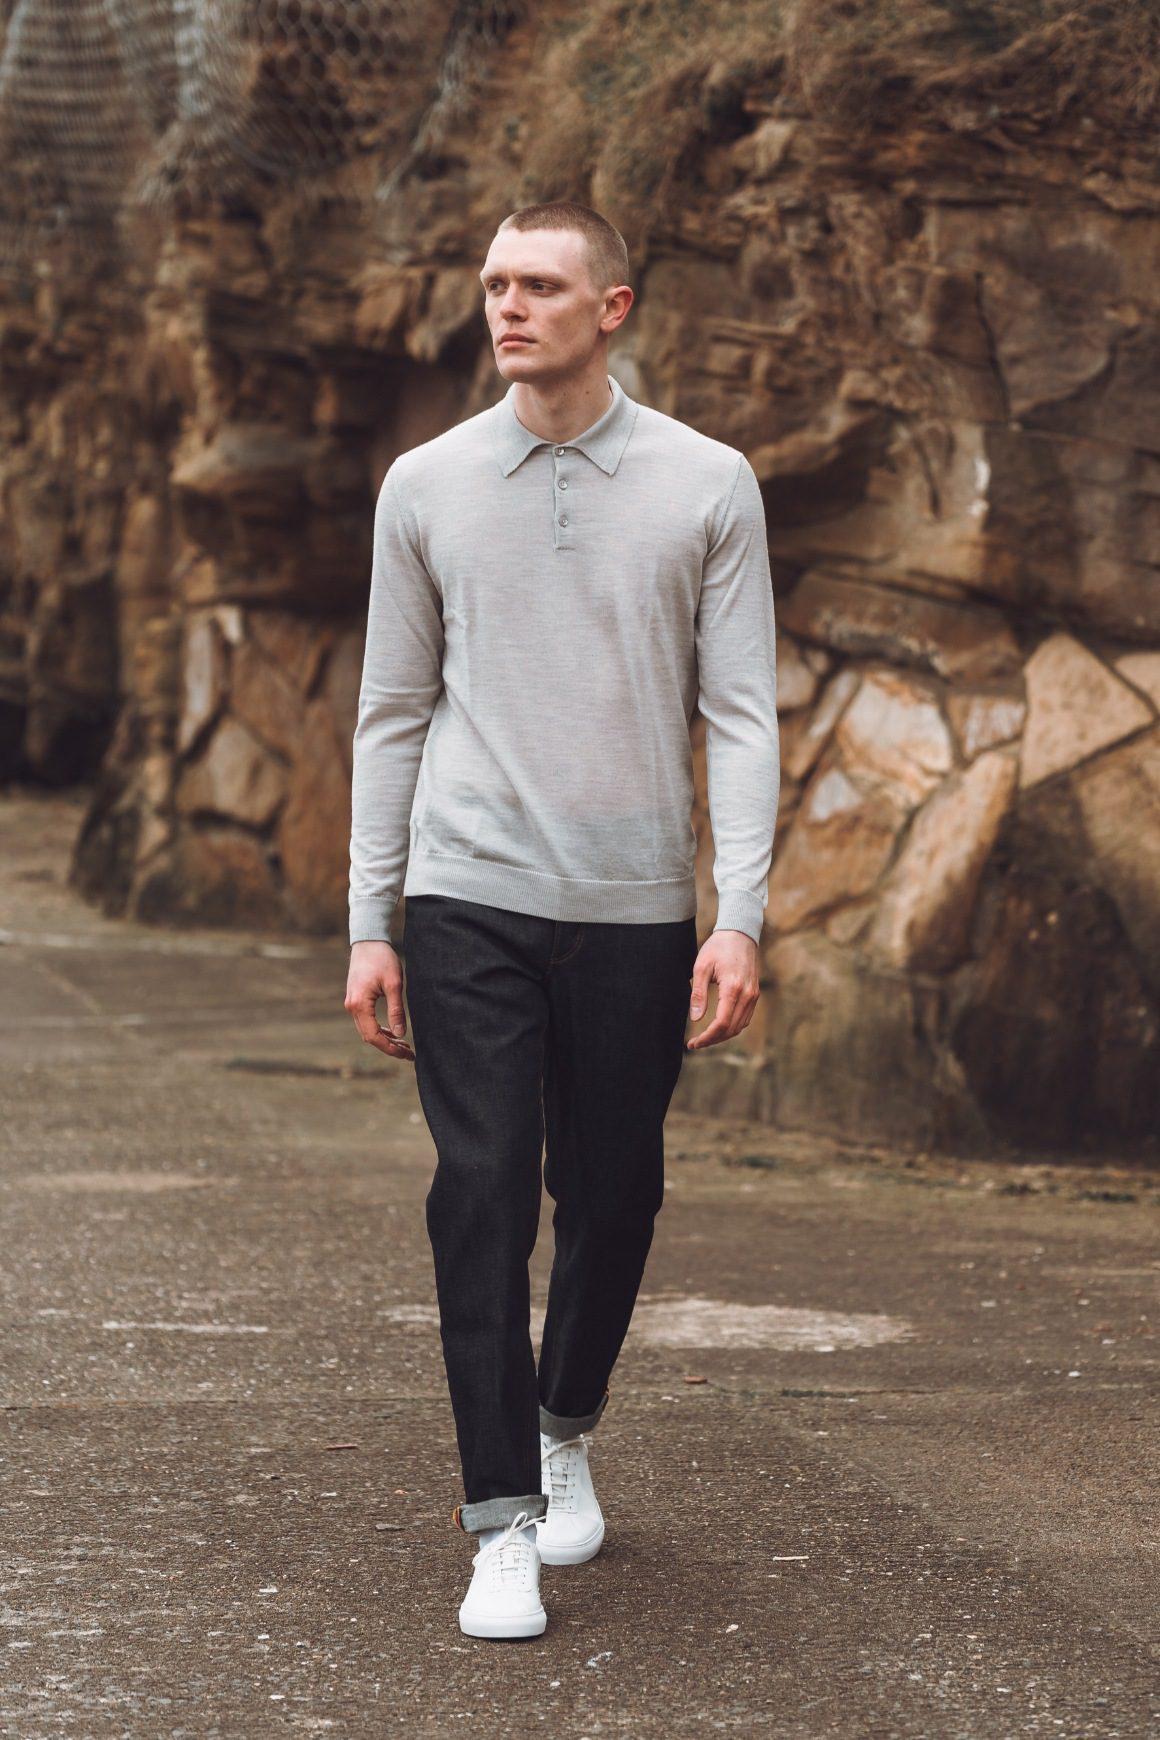 Everyday Essentials: 5 Easy Ways To Style Your Wardrobe Basics